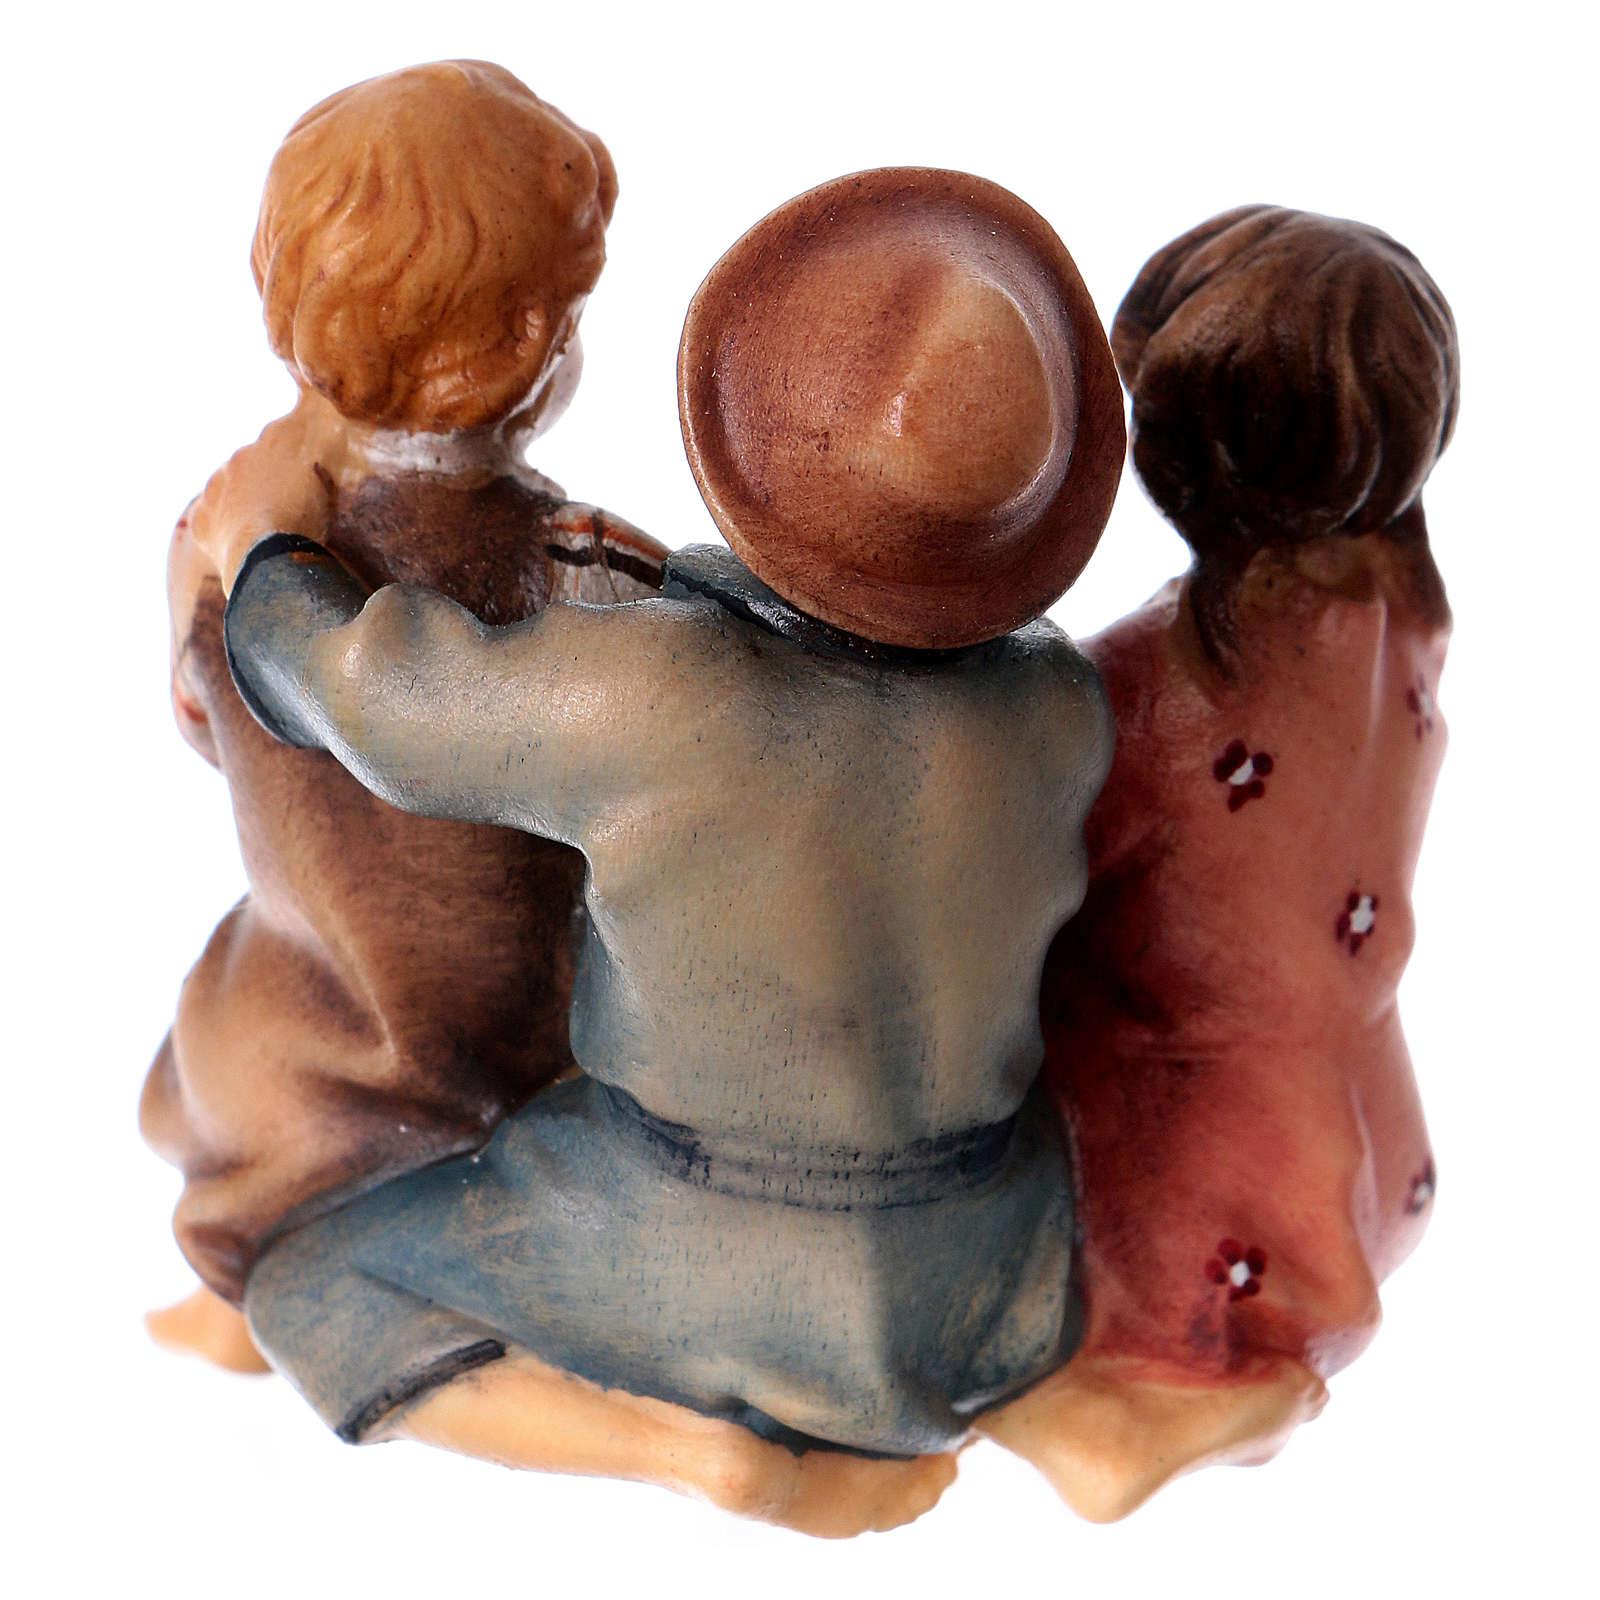 Statuetta gruppo bambini seduti presepe Original legno dipinto Valgardena 10 cm 4